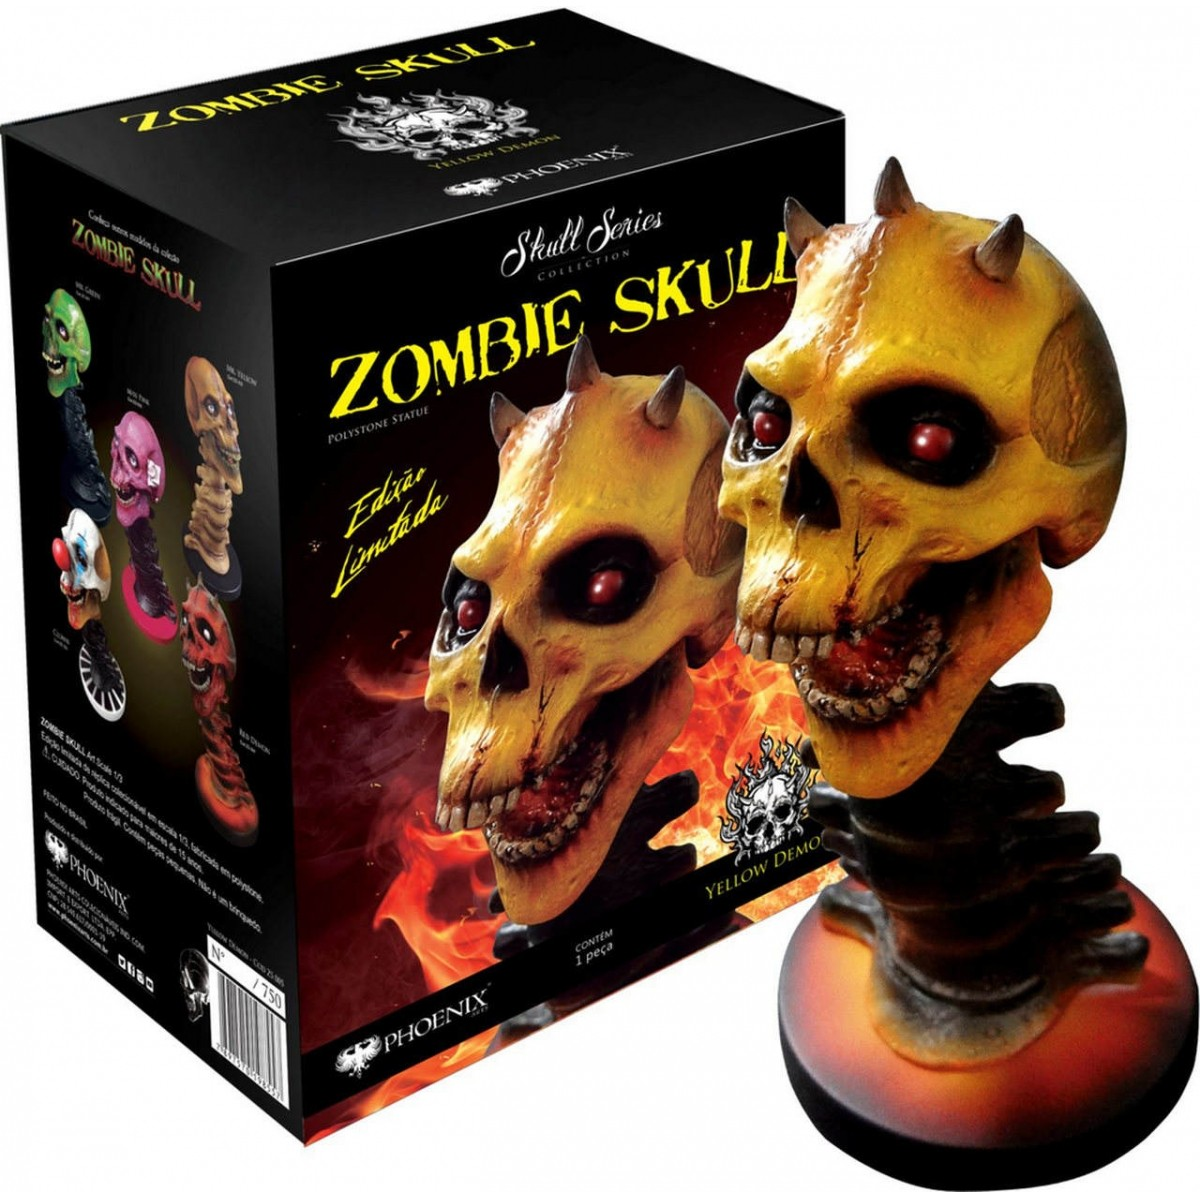 Estátua Zombie Skull Yellow Demon (Amarelo): Art Scale Edição Limitada Escala 1/3 - Phoenix Arts